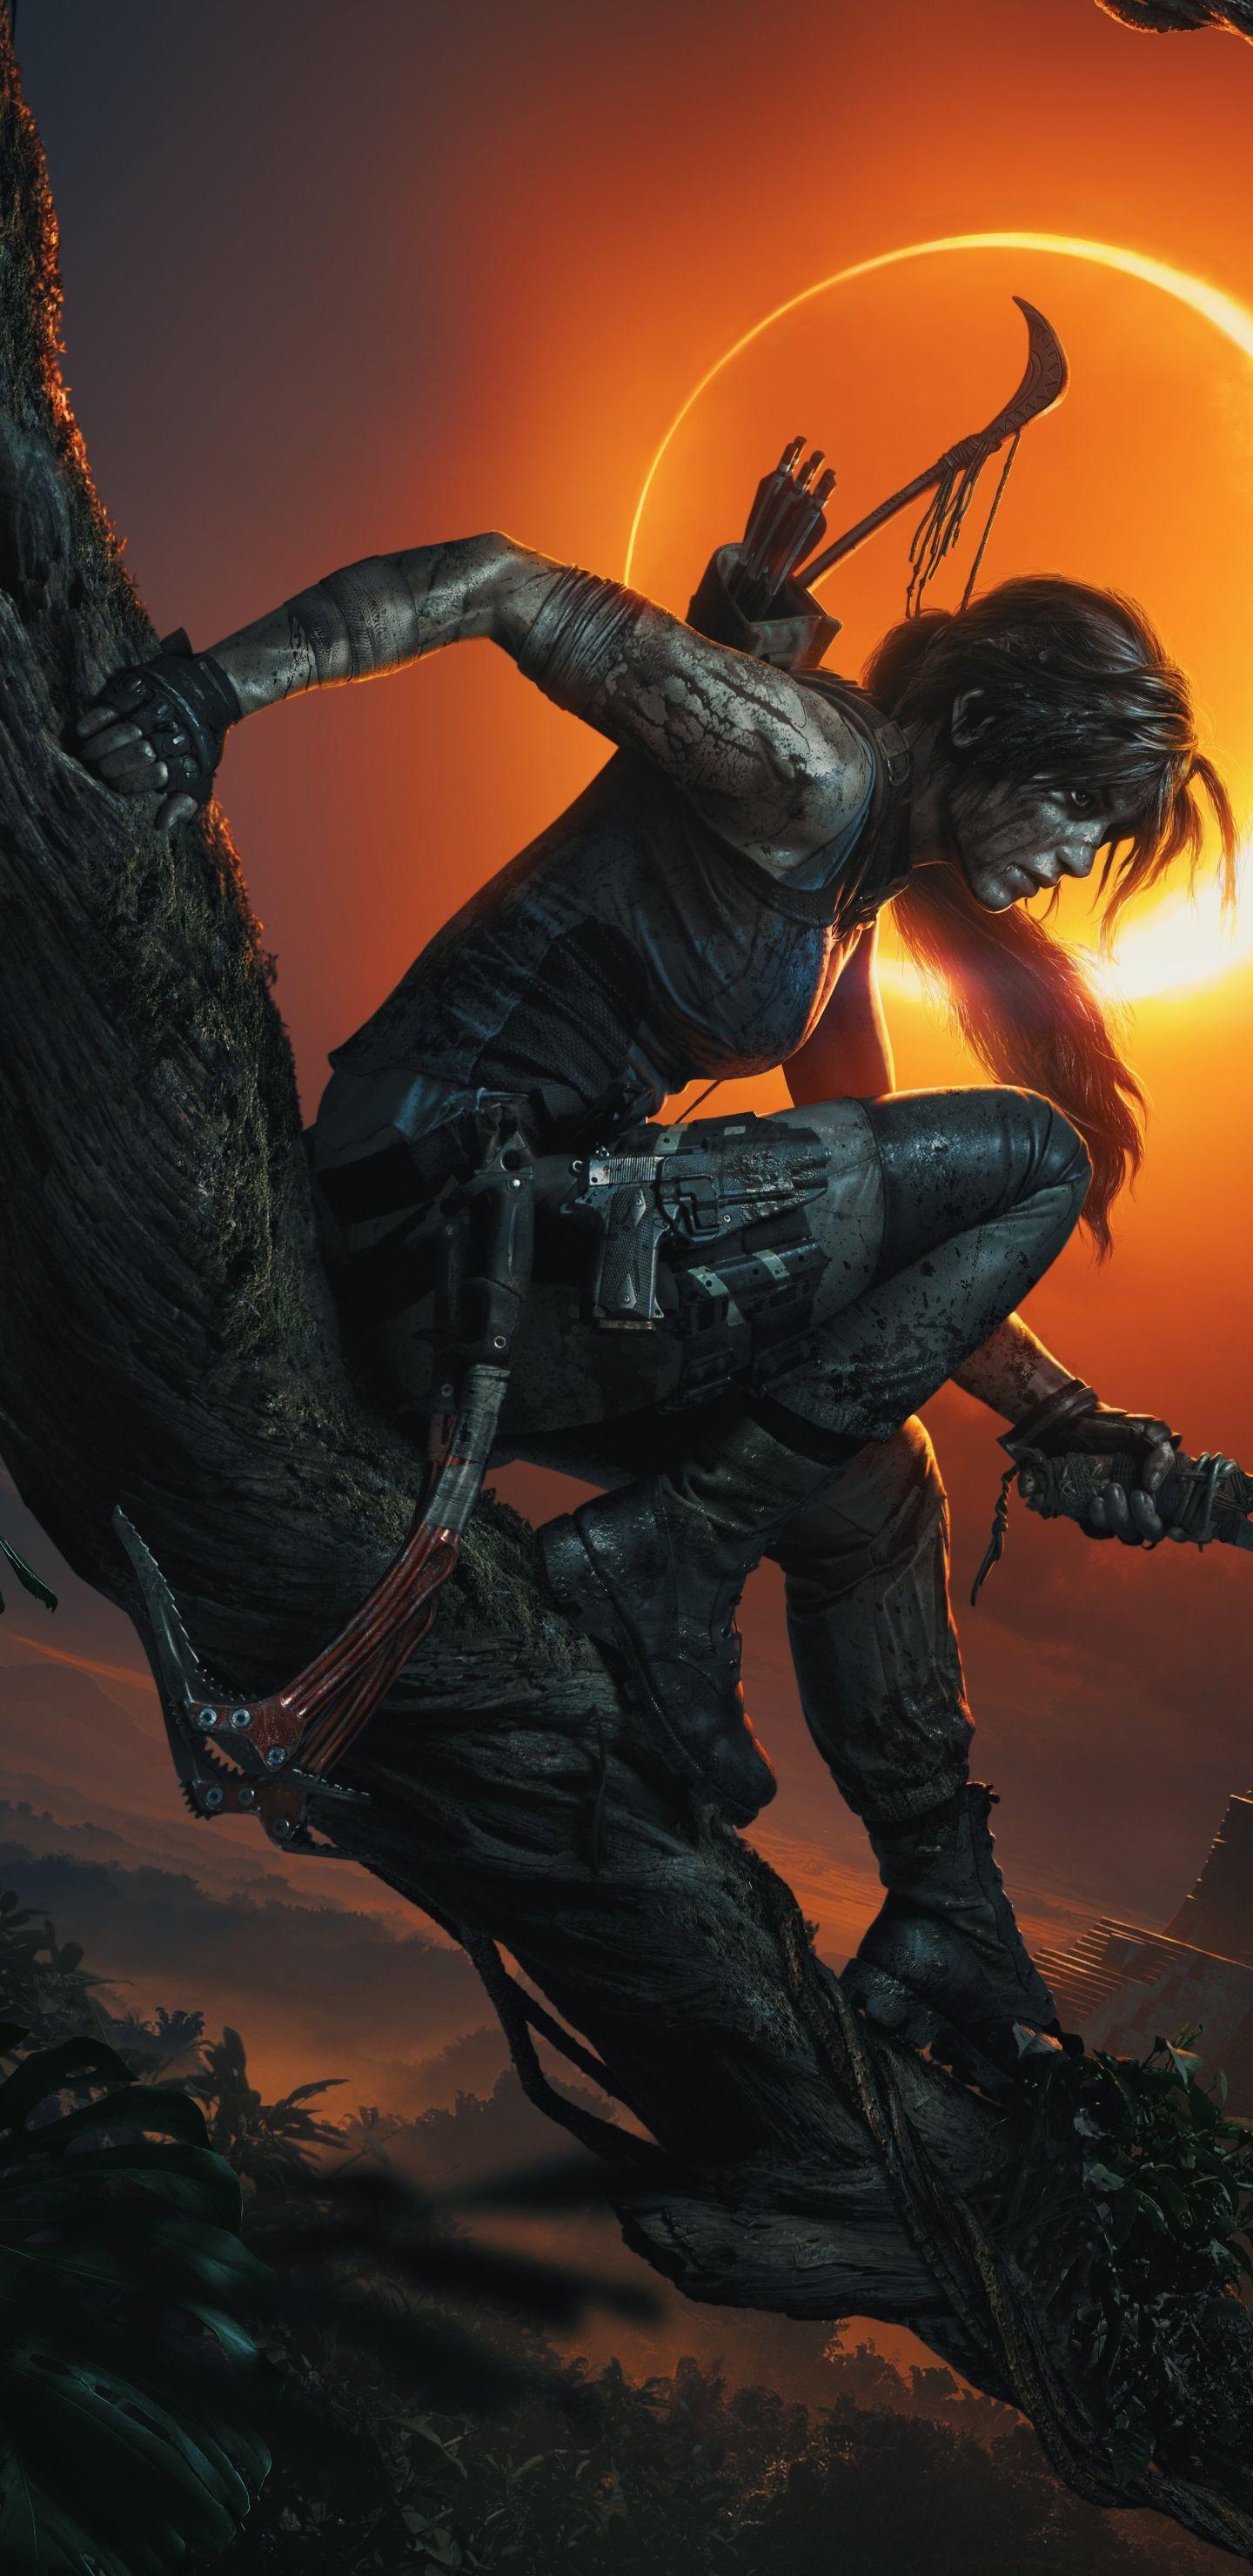 Shadow Of The Tomb Raider Wallpaper Jogos Ps4 Arte De Jogos